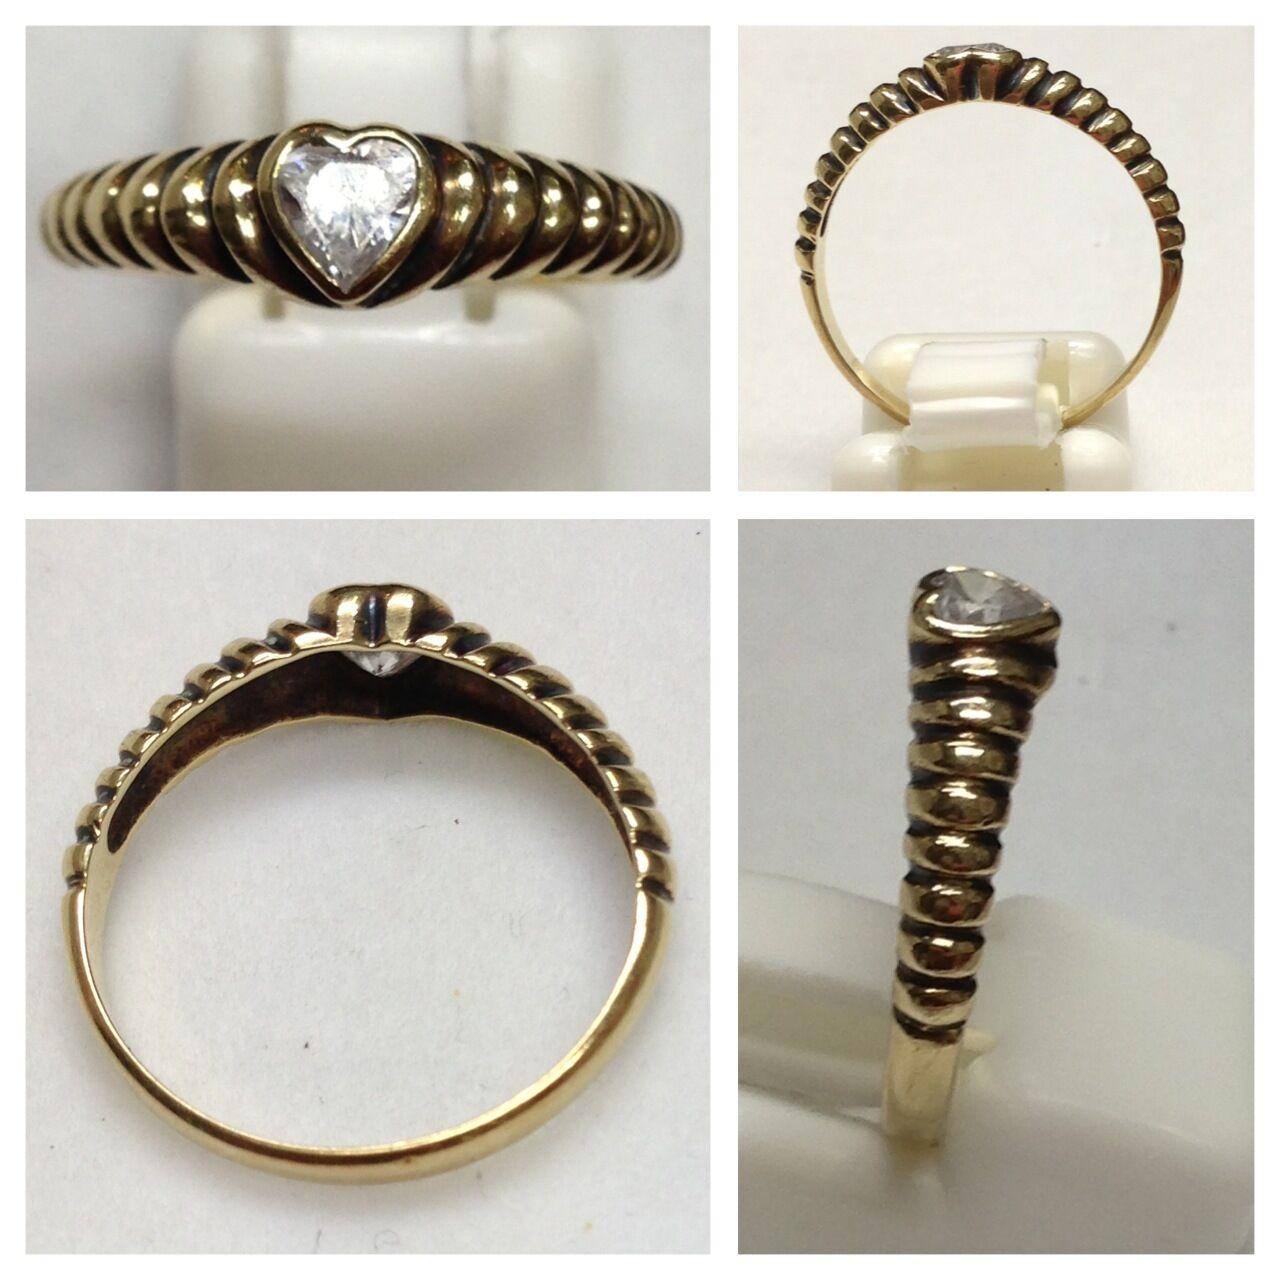 BELLE BAGUE 333 doré bijou EN OR Bague en or avec zircone cœur